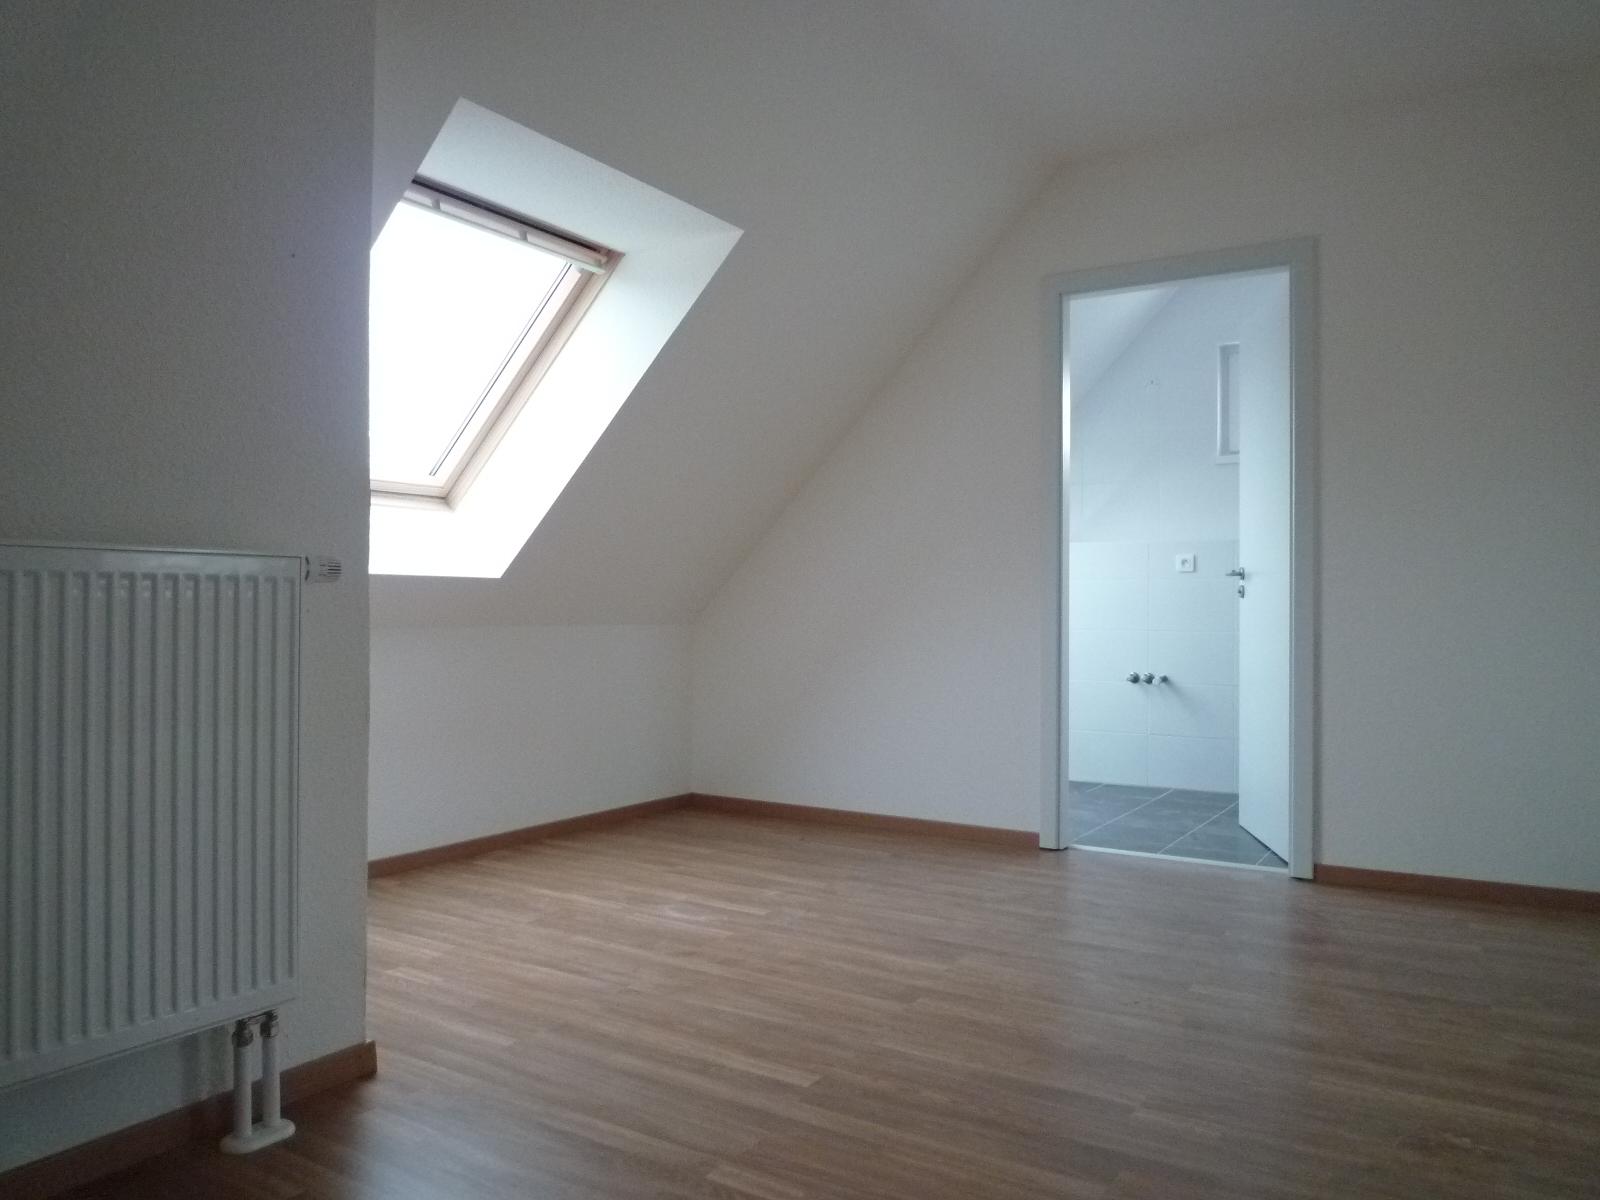 Eligible loi Pinel 21% - LINGOLSHEIM - nos maisons & appartements neufs - Beausite Immobilier 3